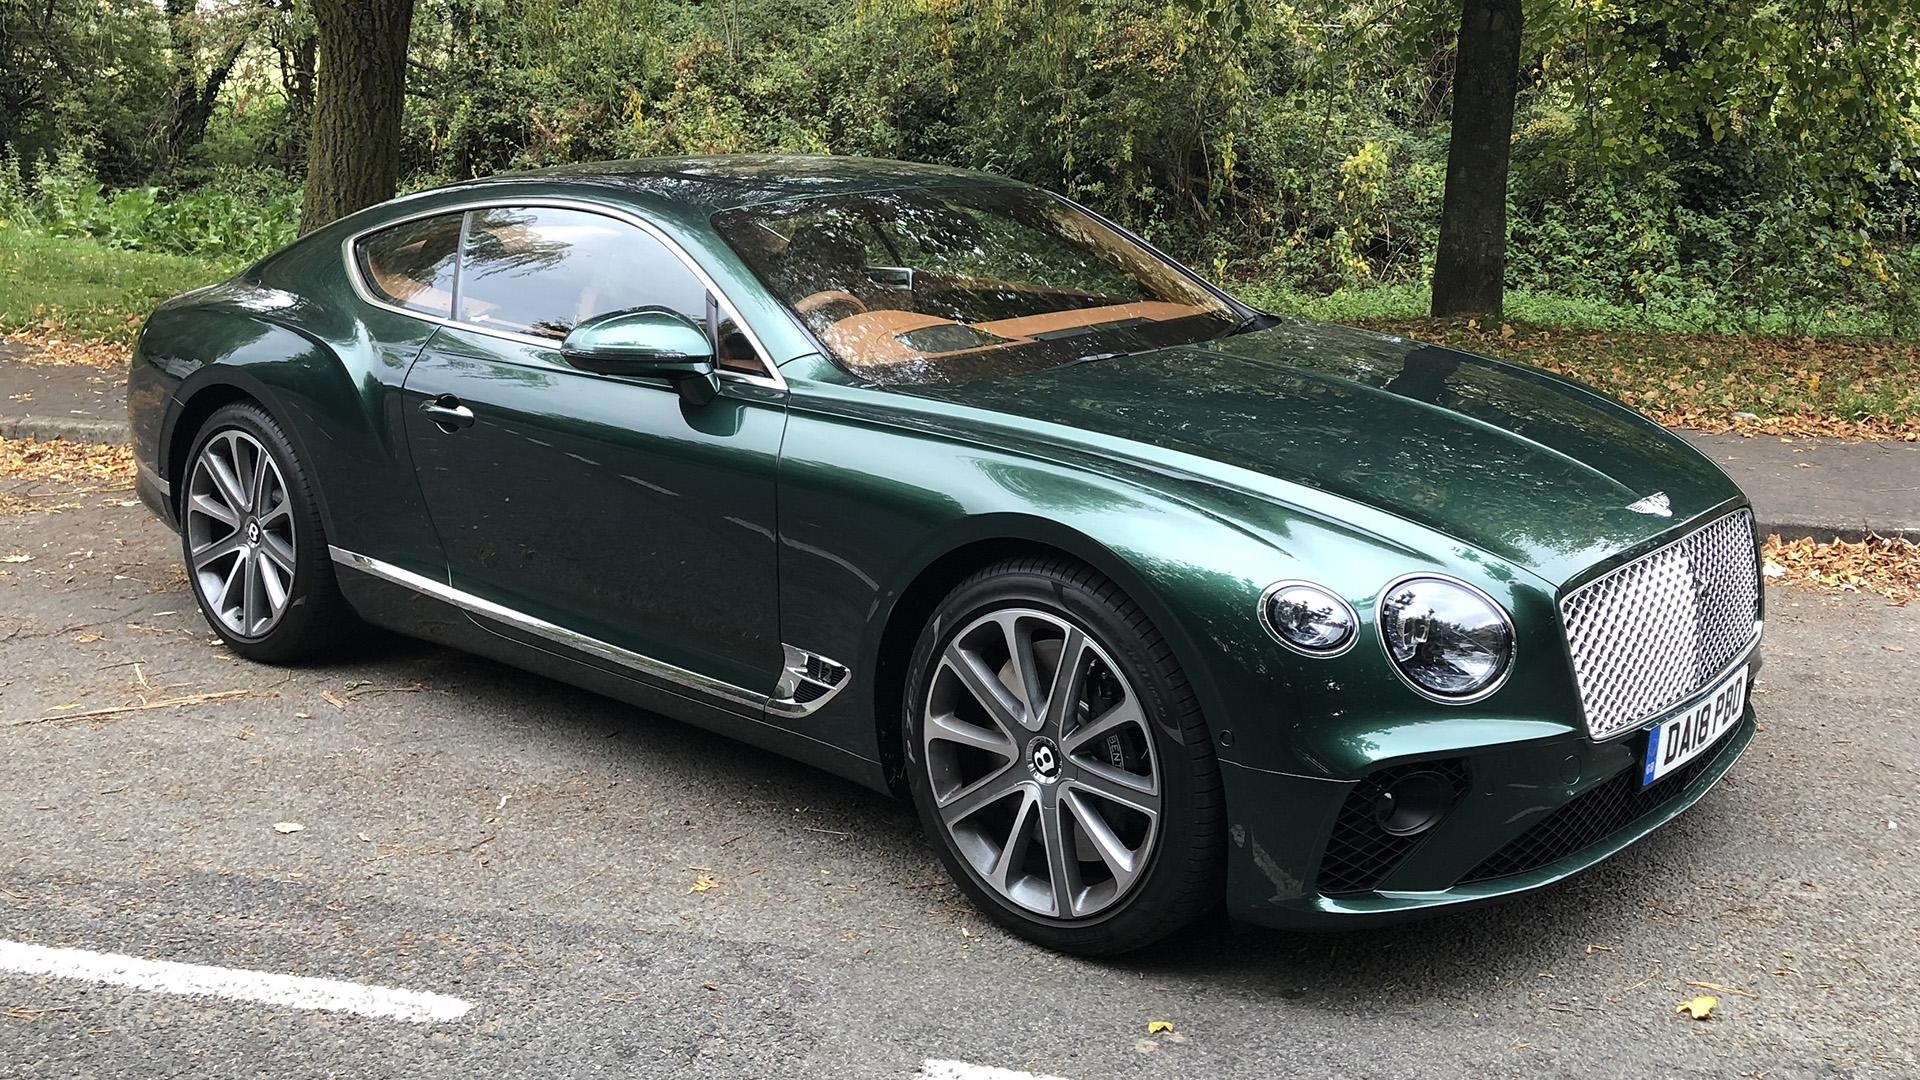 Naim For Bentley Premium Audio System 2019 Bentley Continental Gt